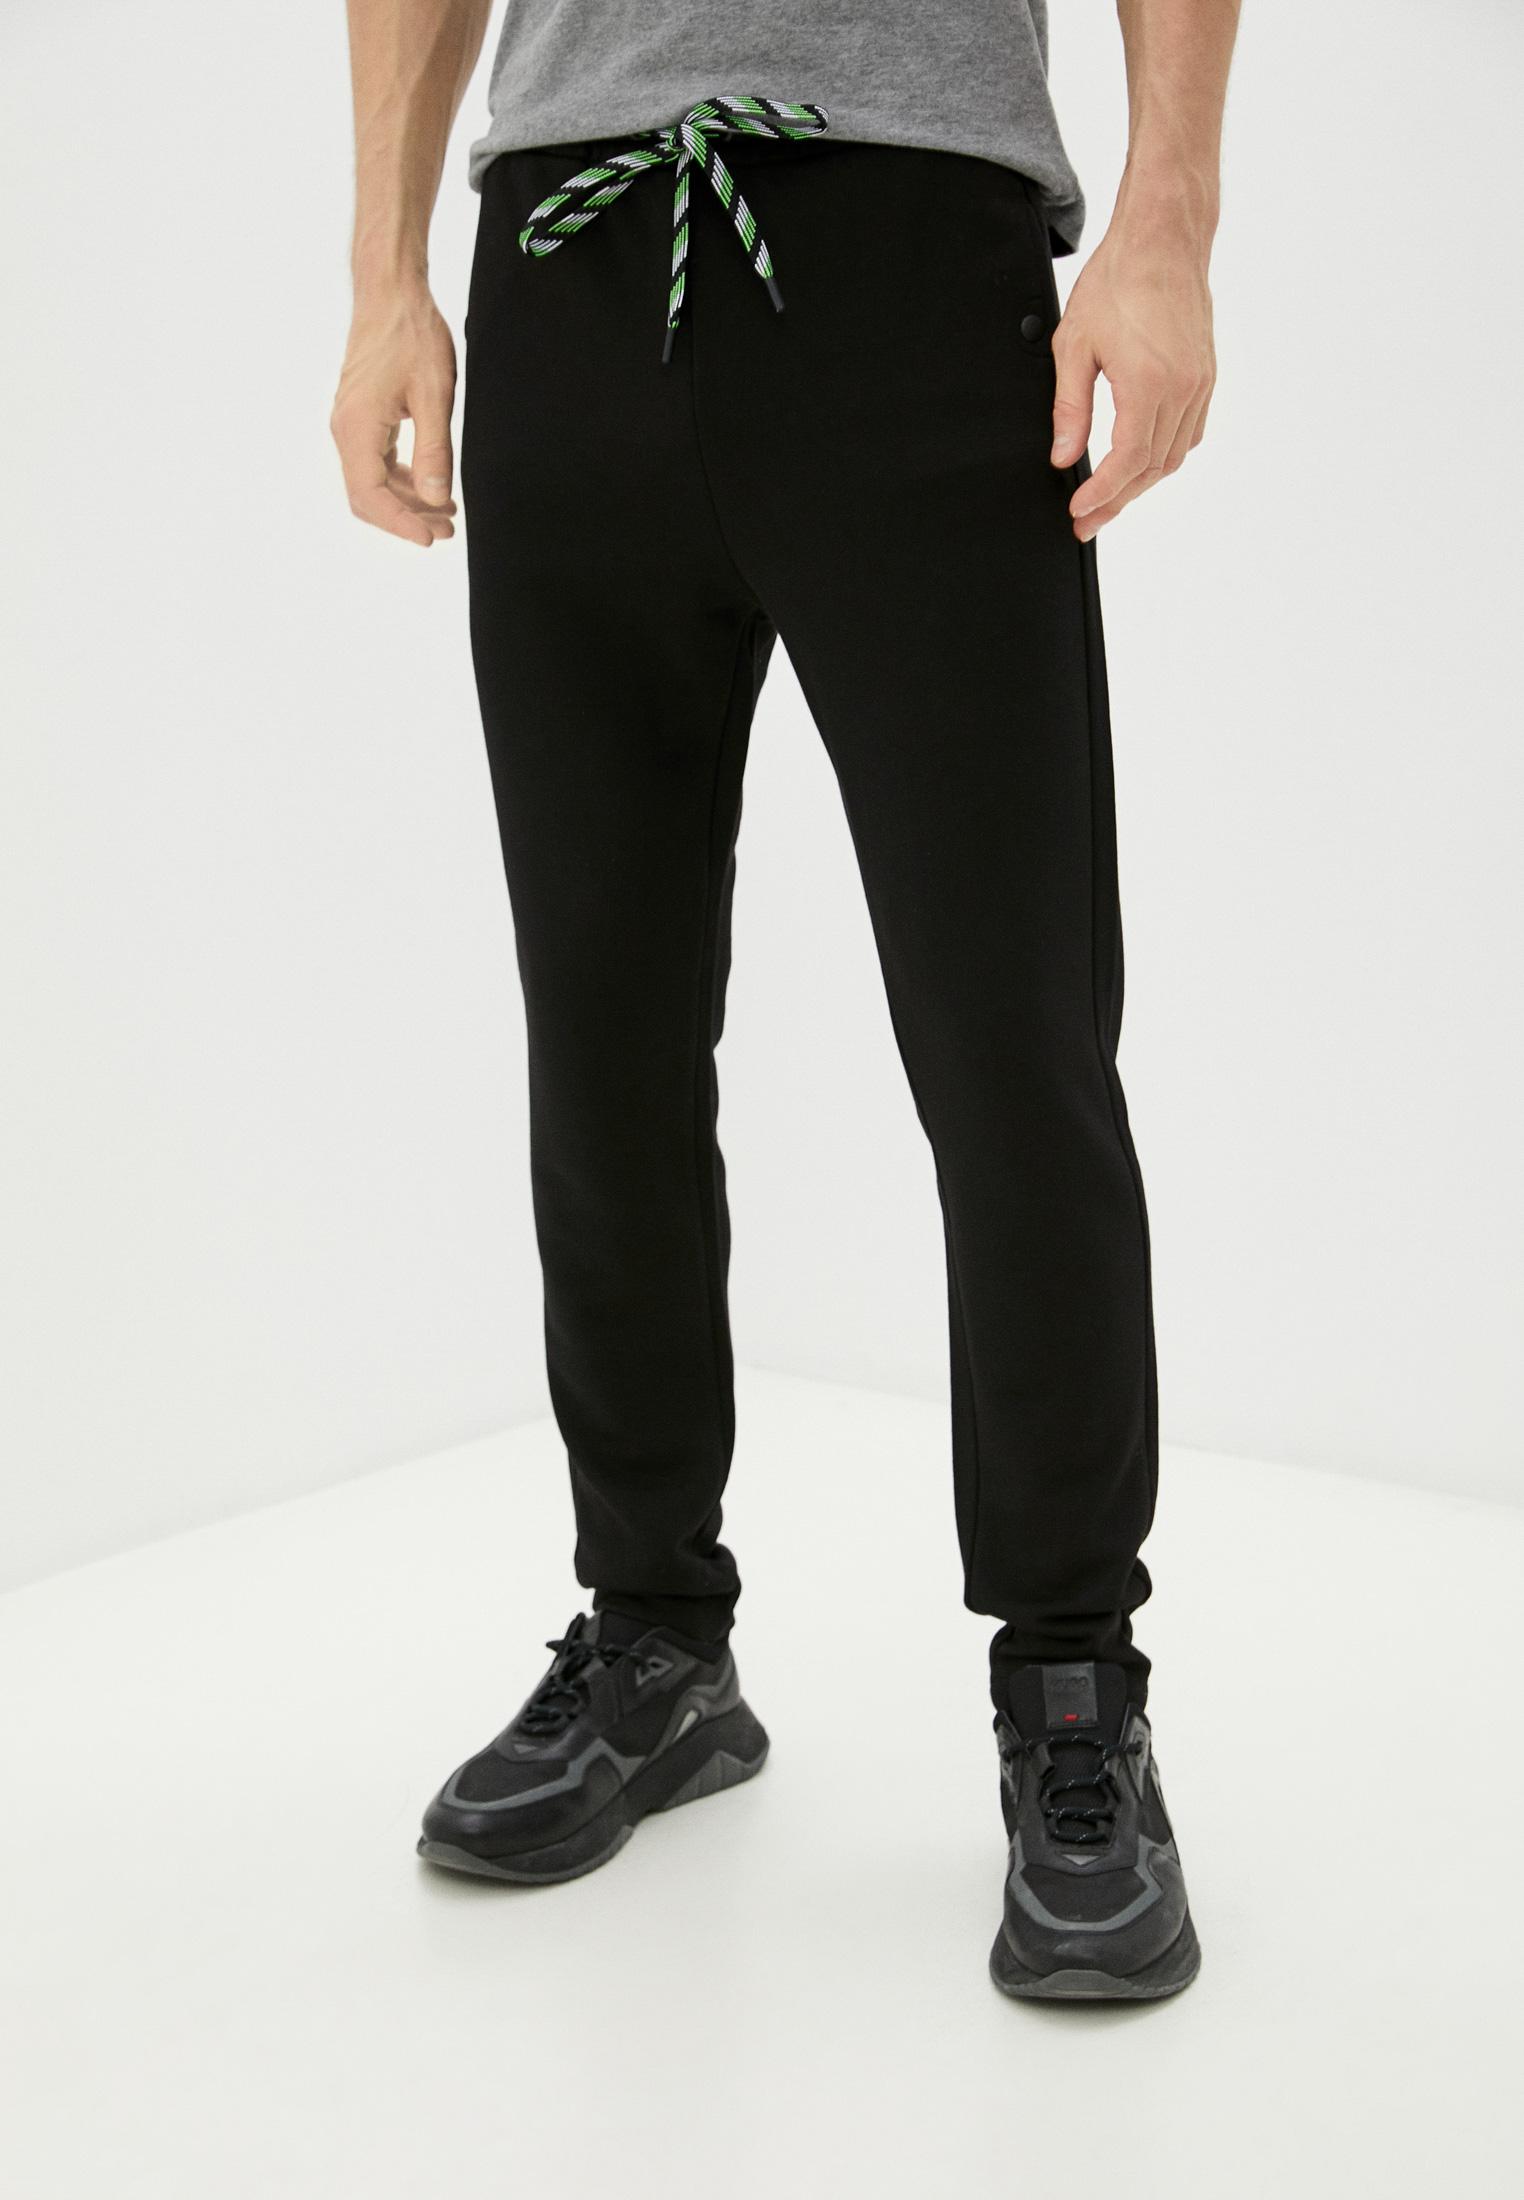 Мужские спортивные брюки Bikkembergs (Биккембергс) C 1 208 80 M 4297